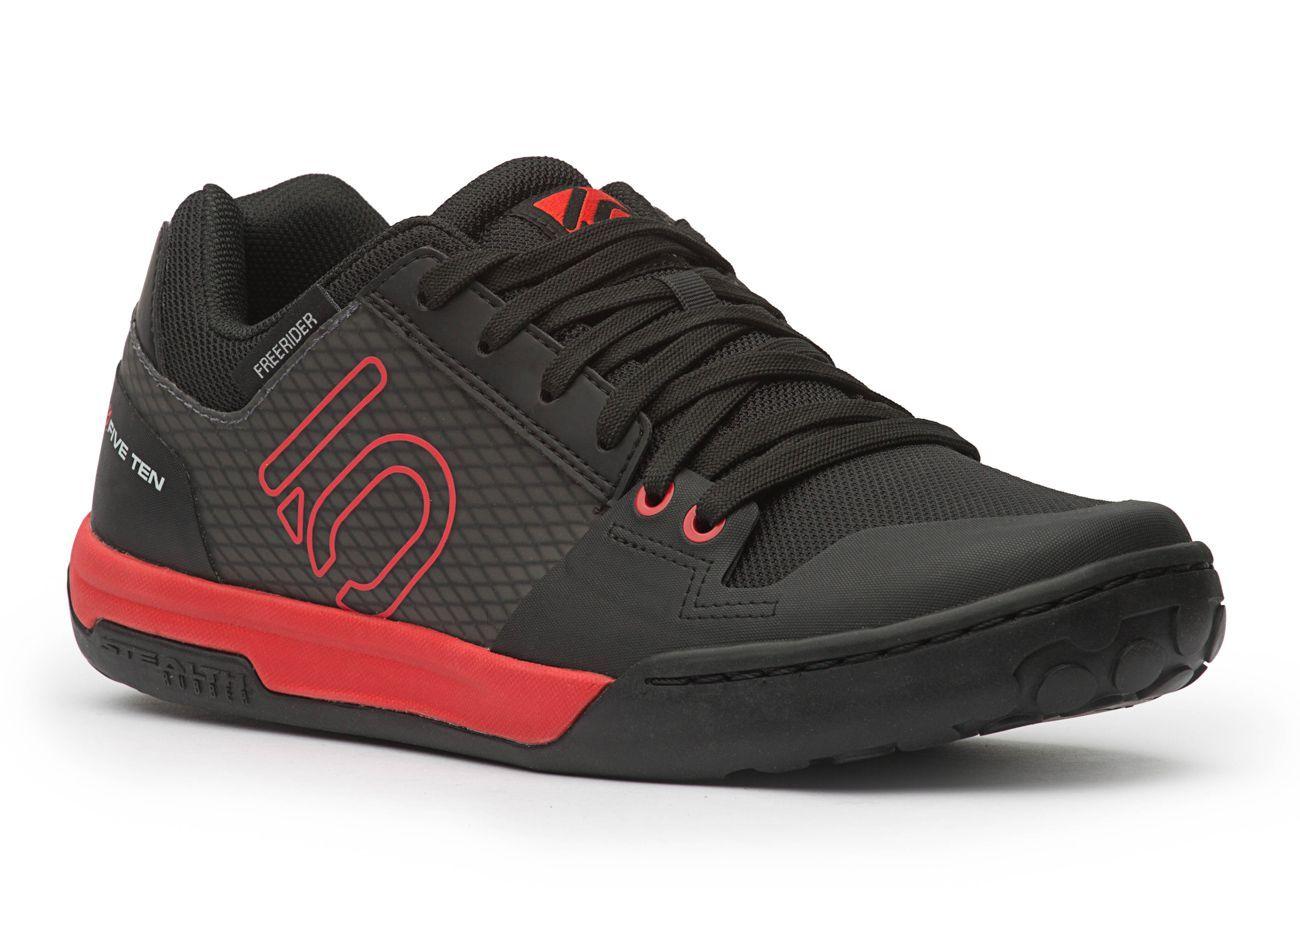 Mountain bike shoes, Mtb shoes